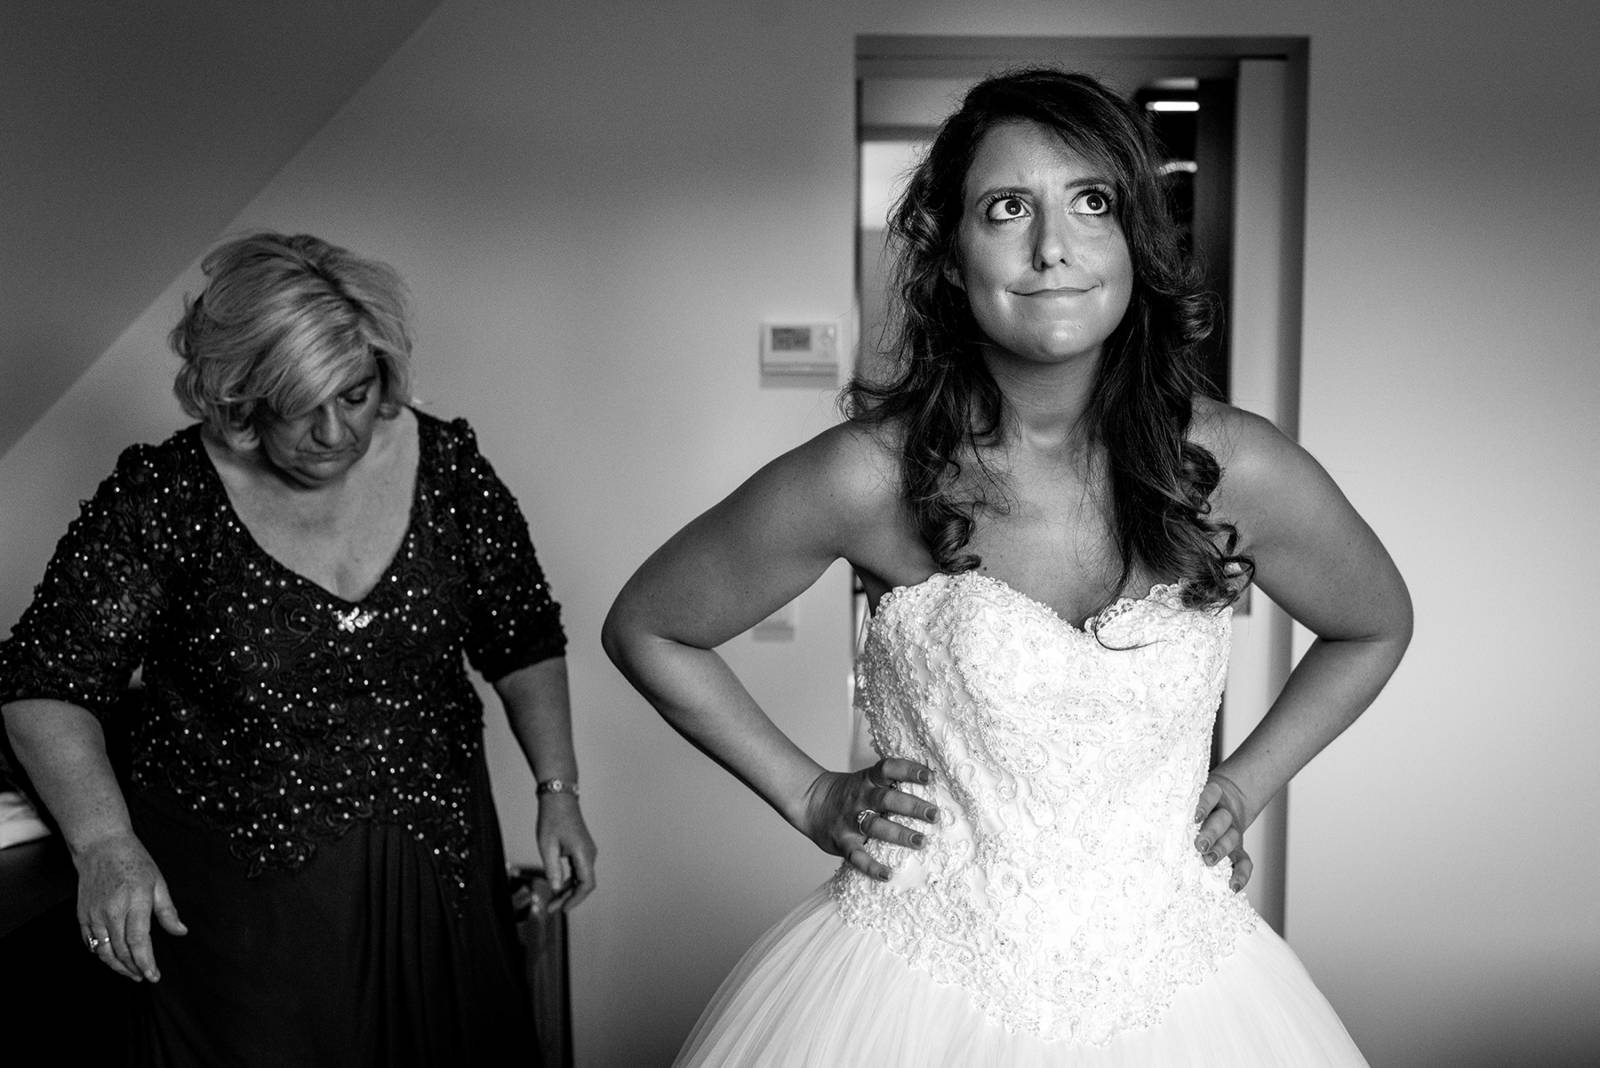 Fotografie Melody - Huwelijksfotograaf - Trouwfotograaf - House of Weddings - 10